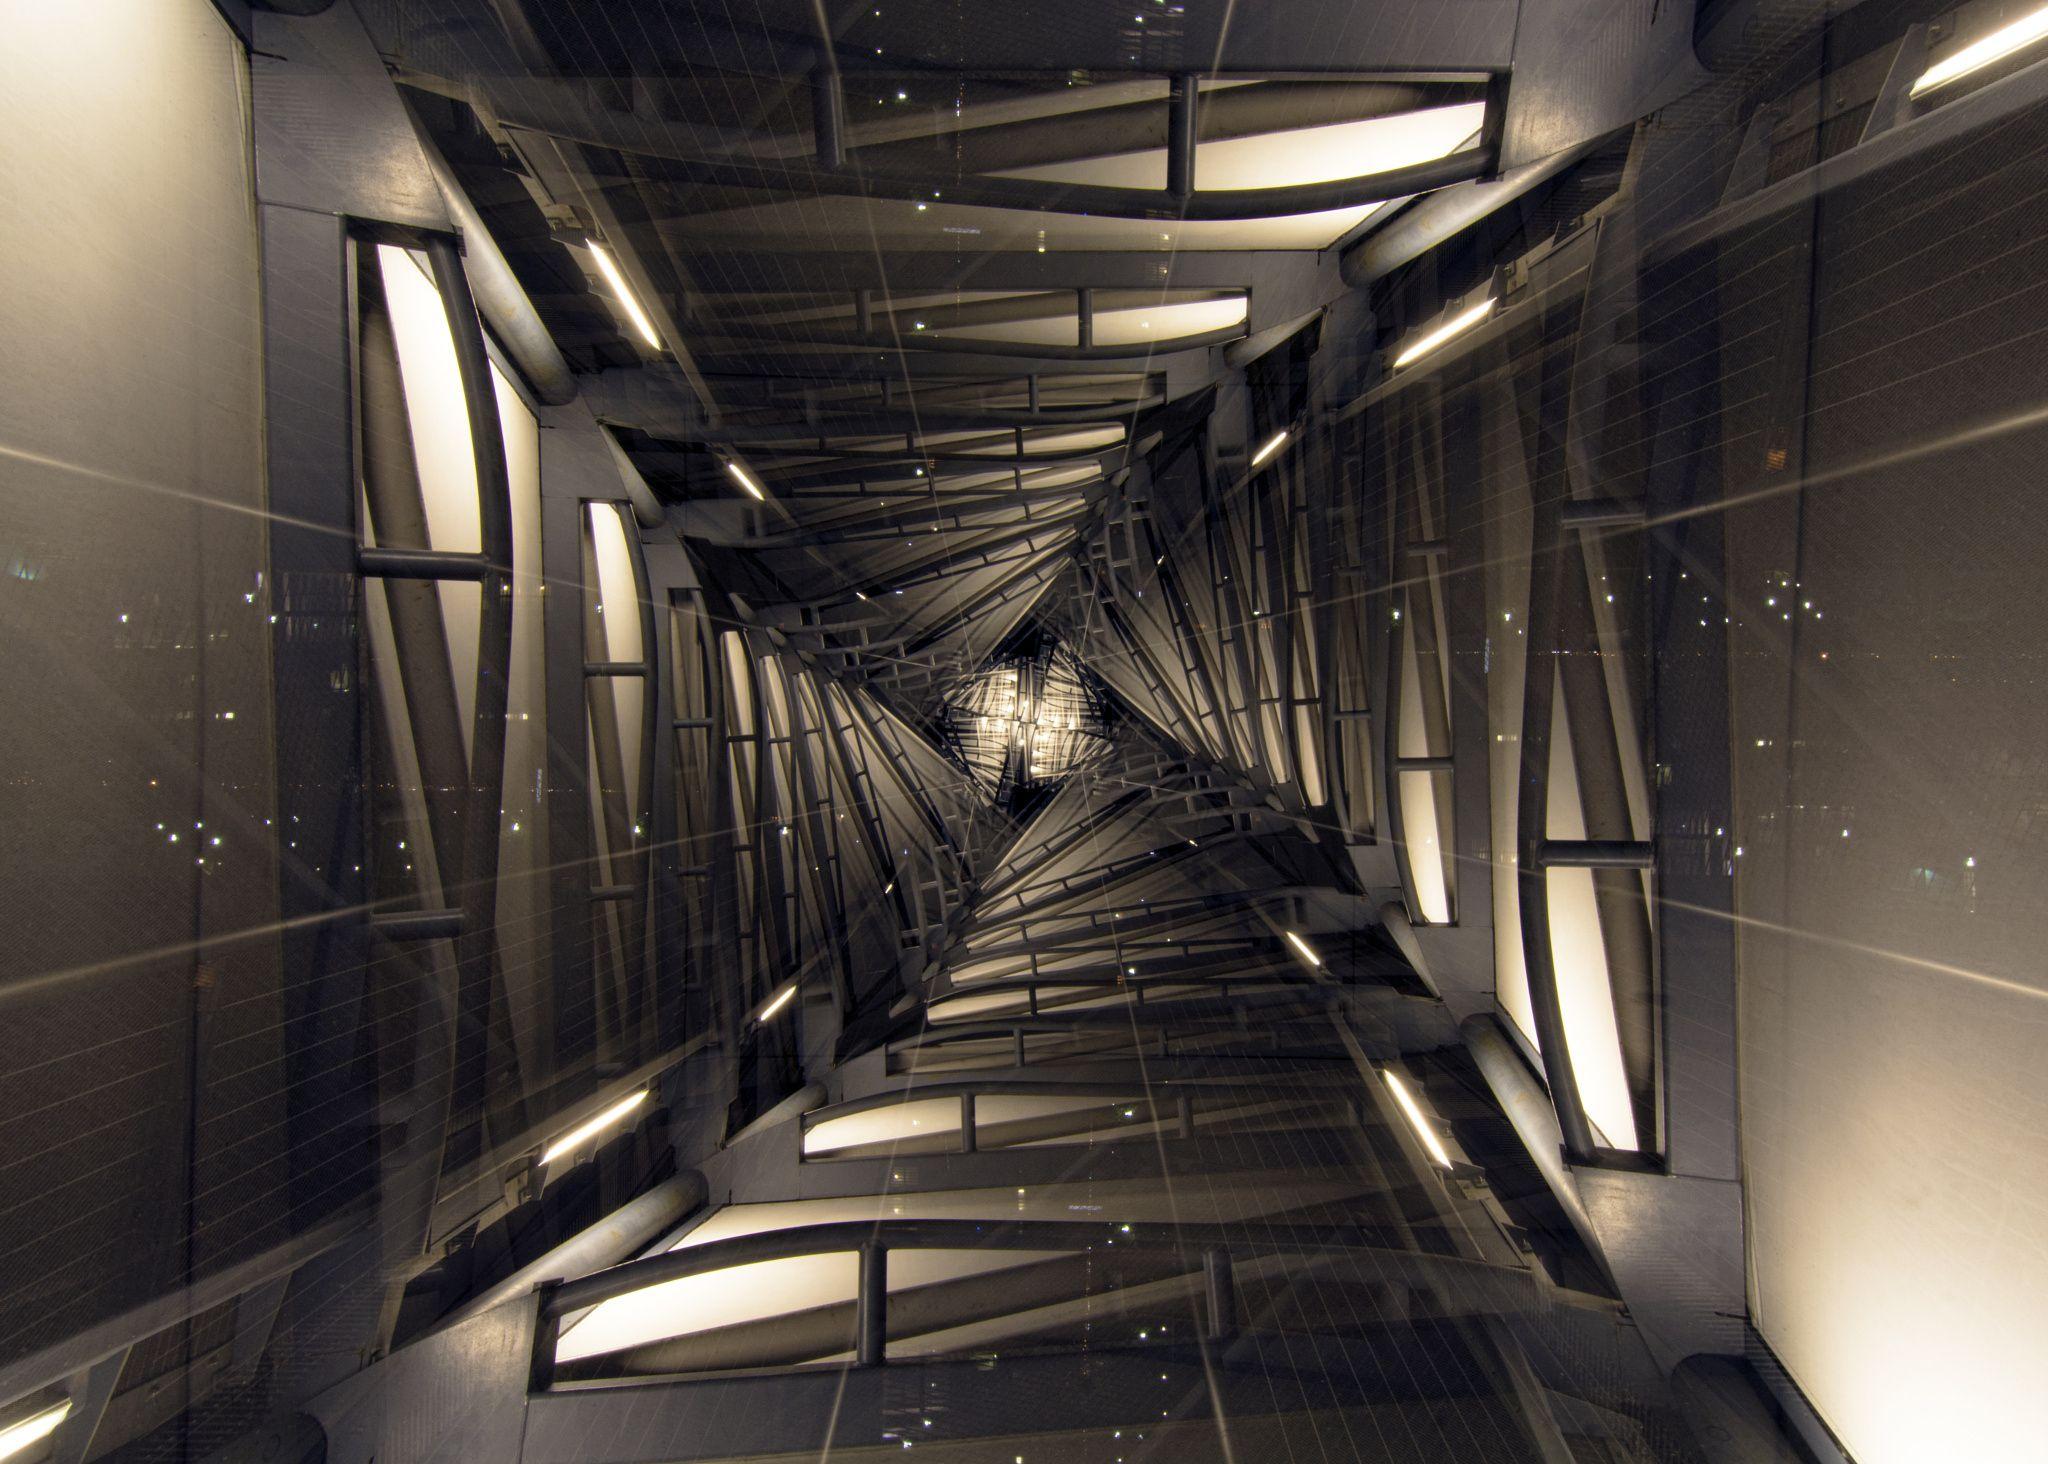 Photograph Helix Kaleidoscope by Paul Scearce on 500px